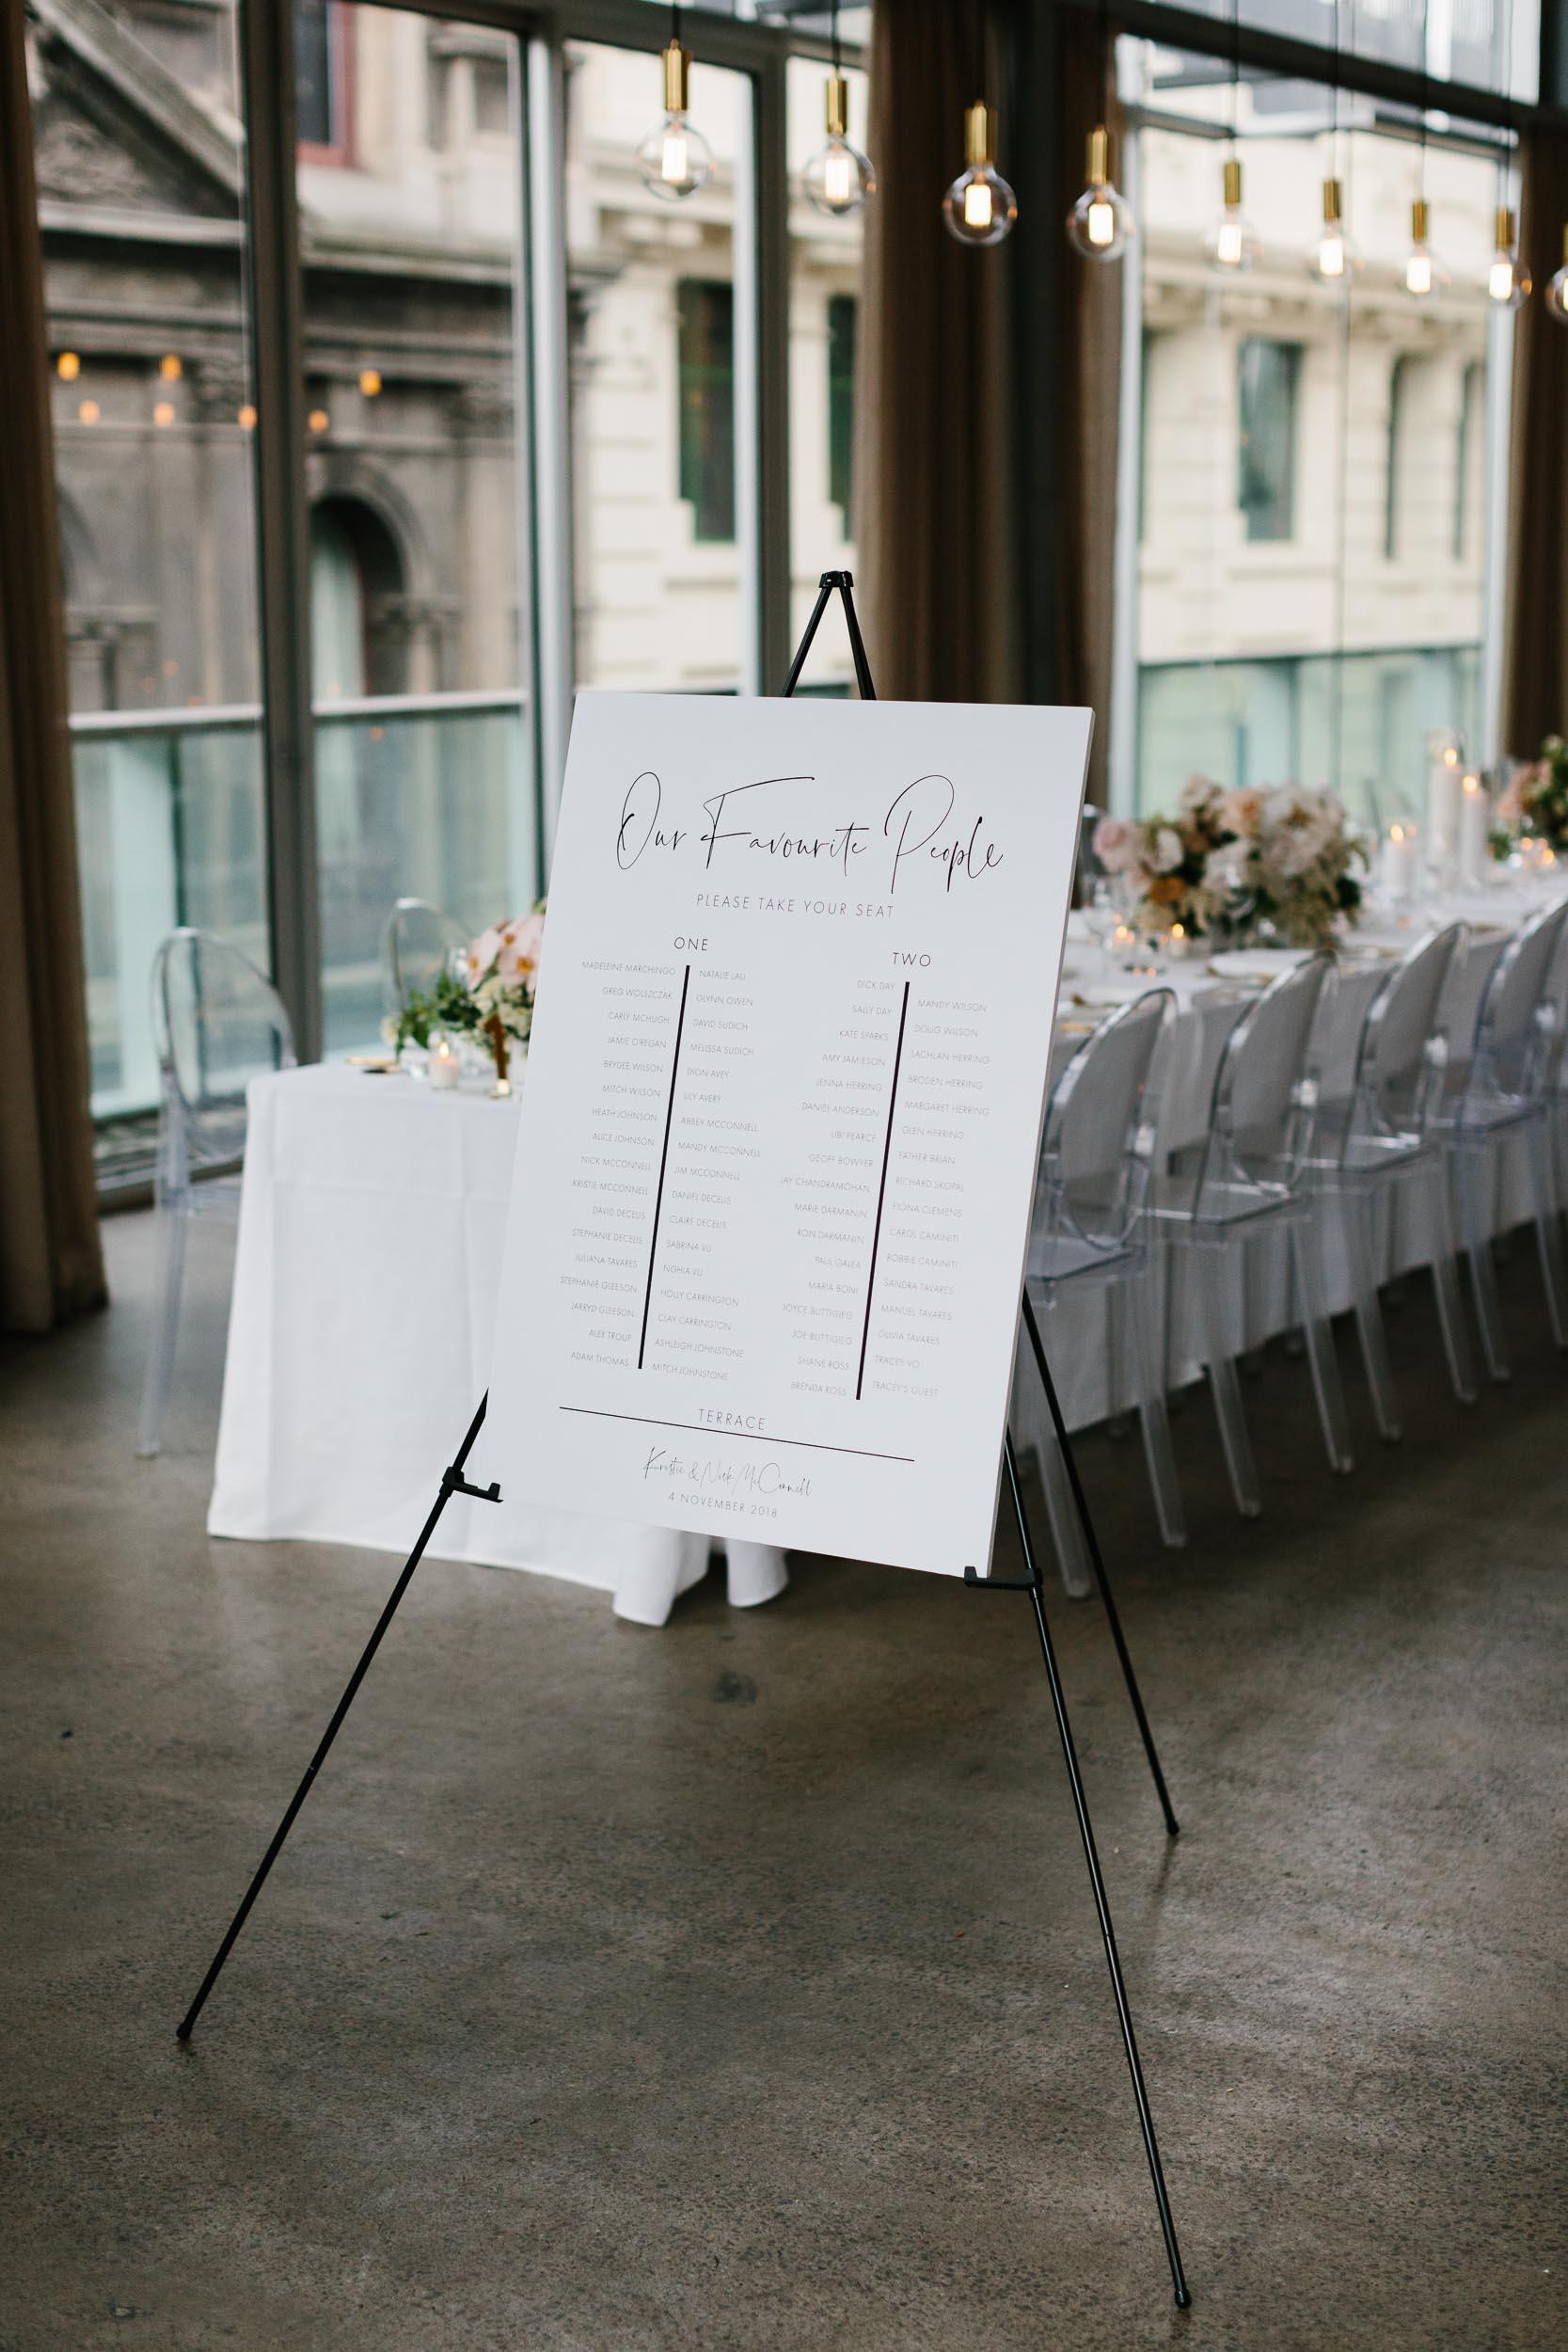 Kas-Richards-Wedding-Photographer-Melbourne-City-Wedding-Alto-Event-Space-Jane-Hill-Bridal-Gown-37.jpg